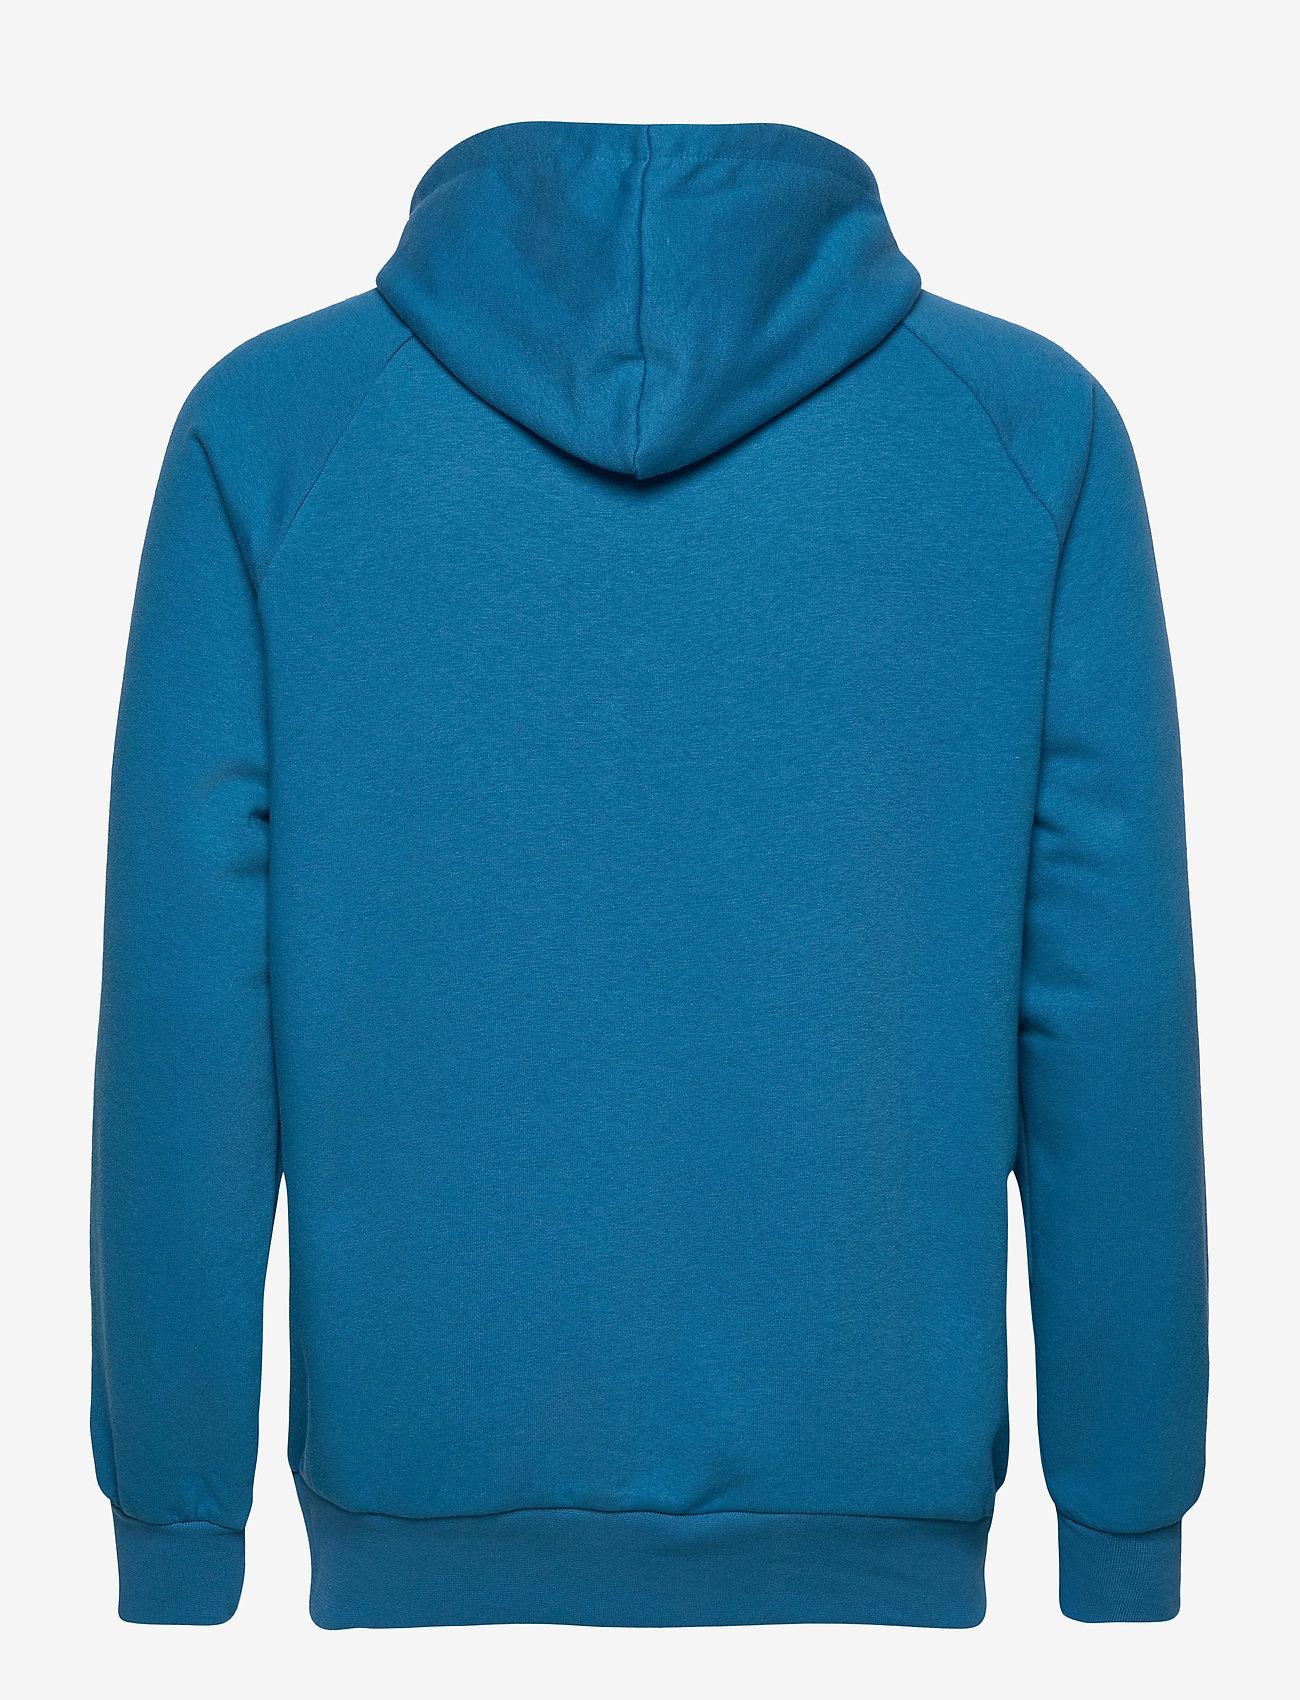 Hummel hmlISAM HOODIE - Sweatshirts BLUE SAPPHIRE - Menn Klær